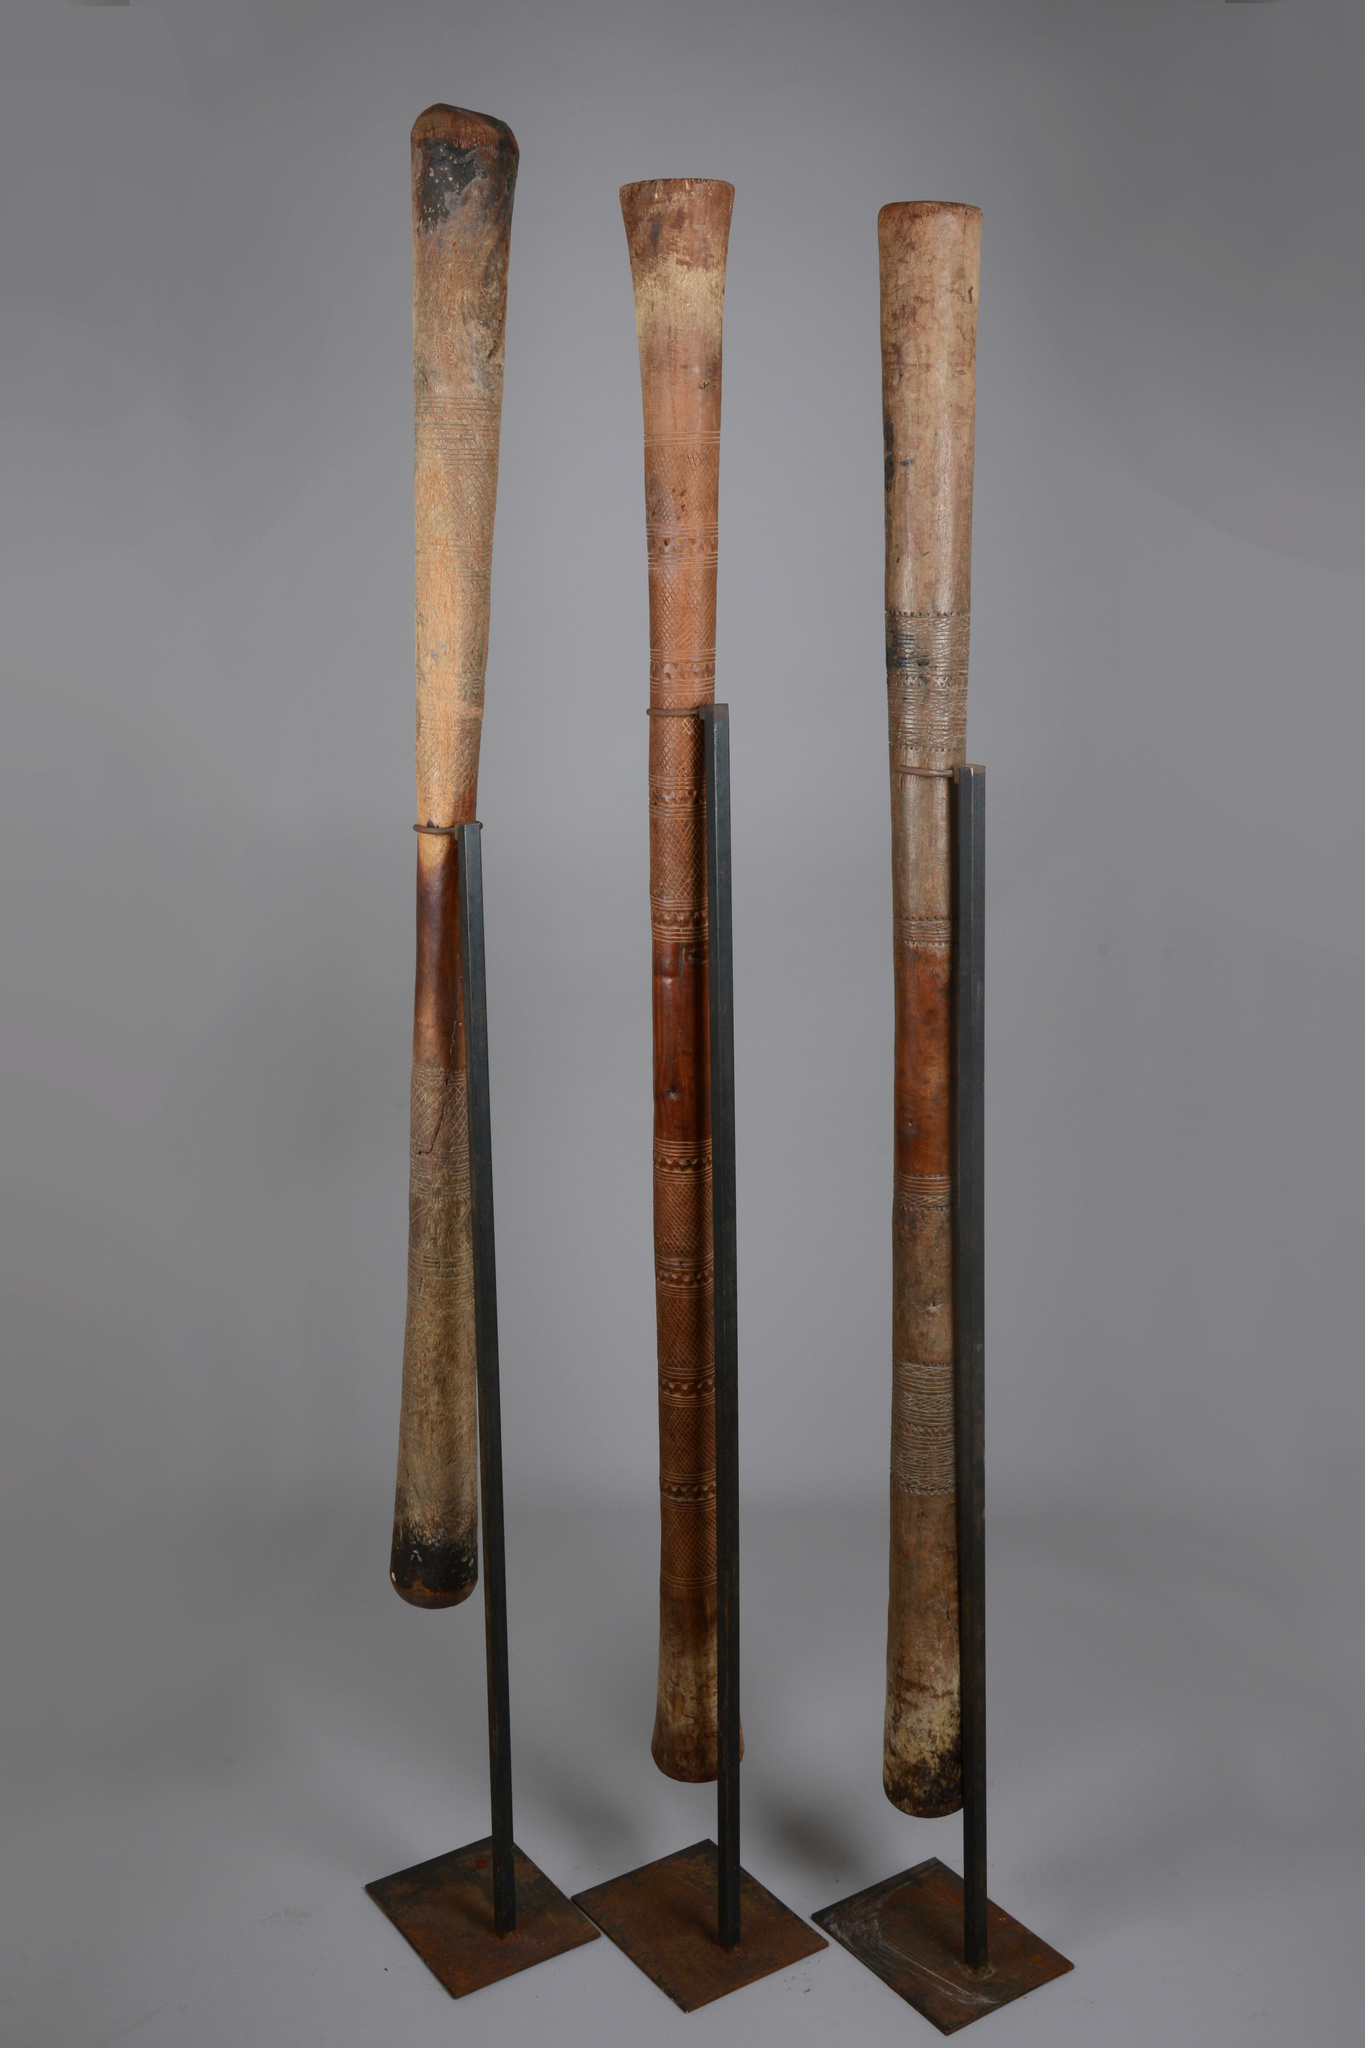 Three old millet pounder